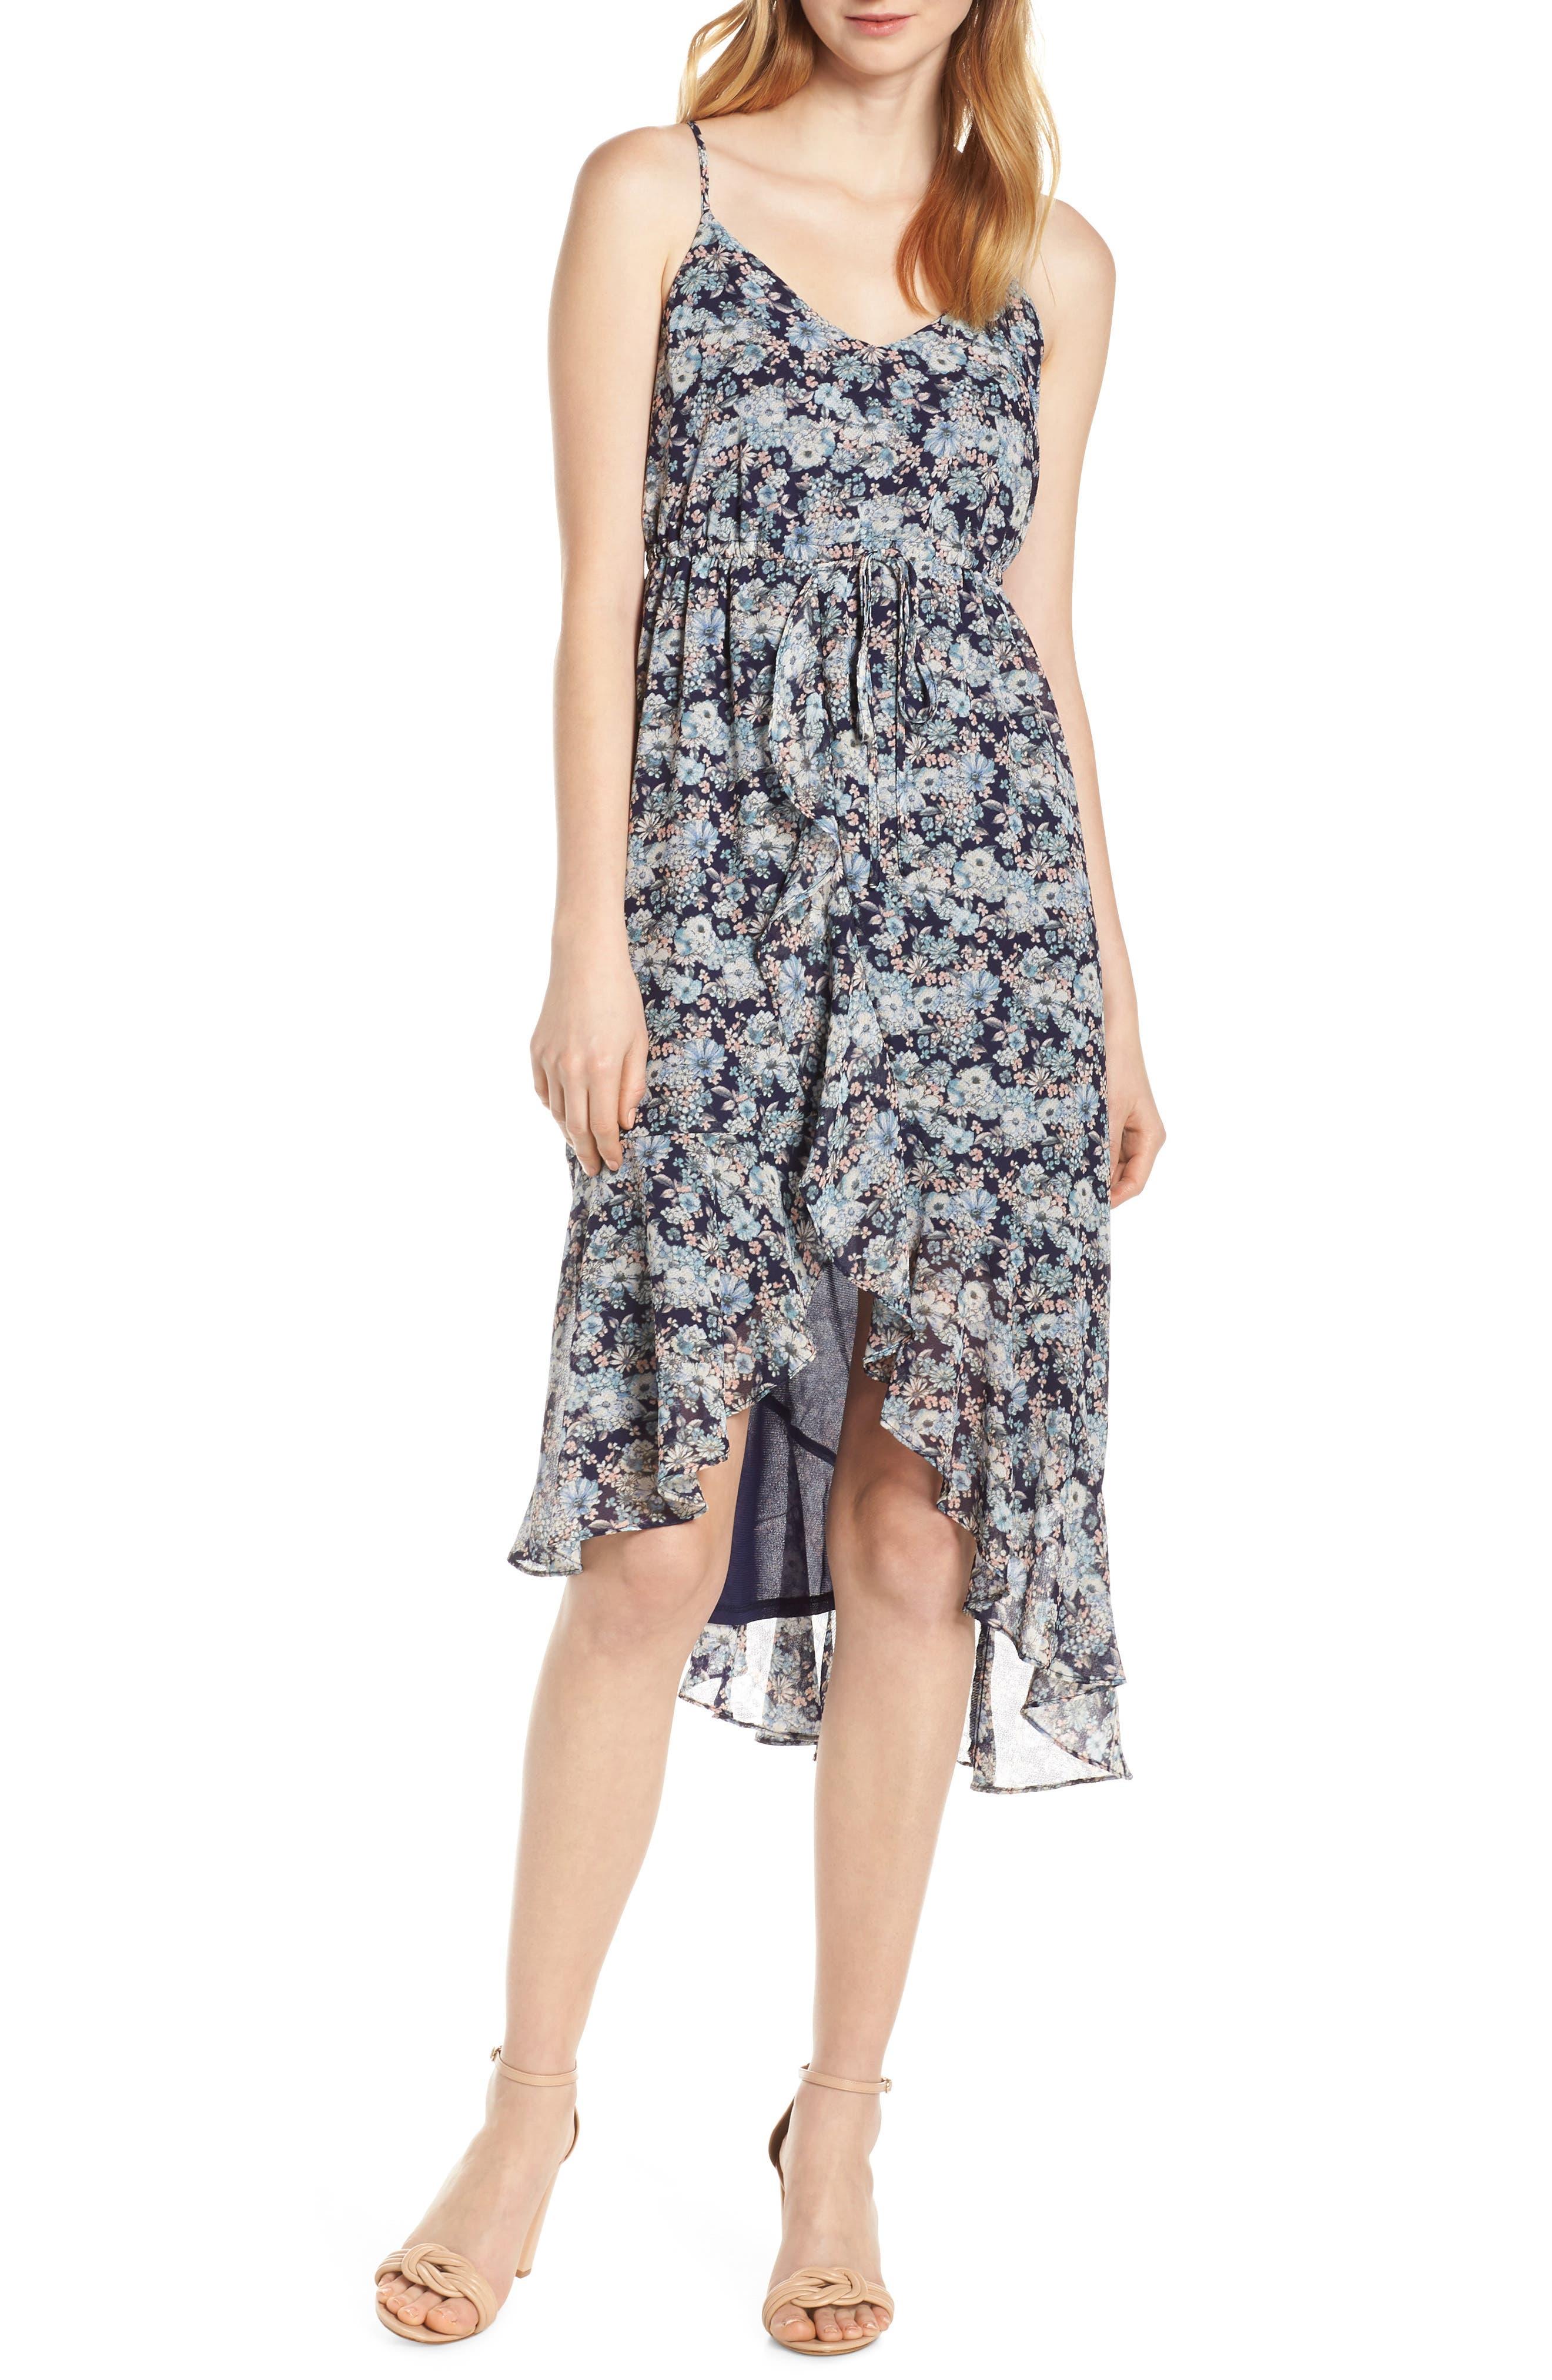 19 COOPER Asymmetrical Ruffle Hem Dress, Main, color, 410